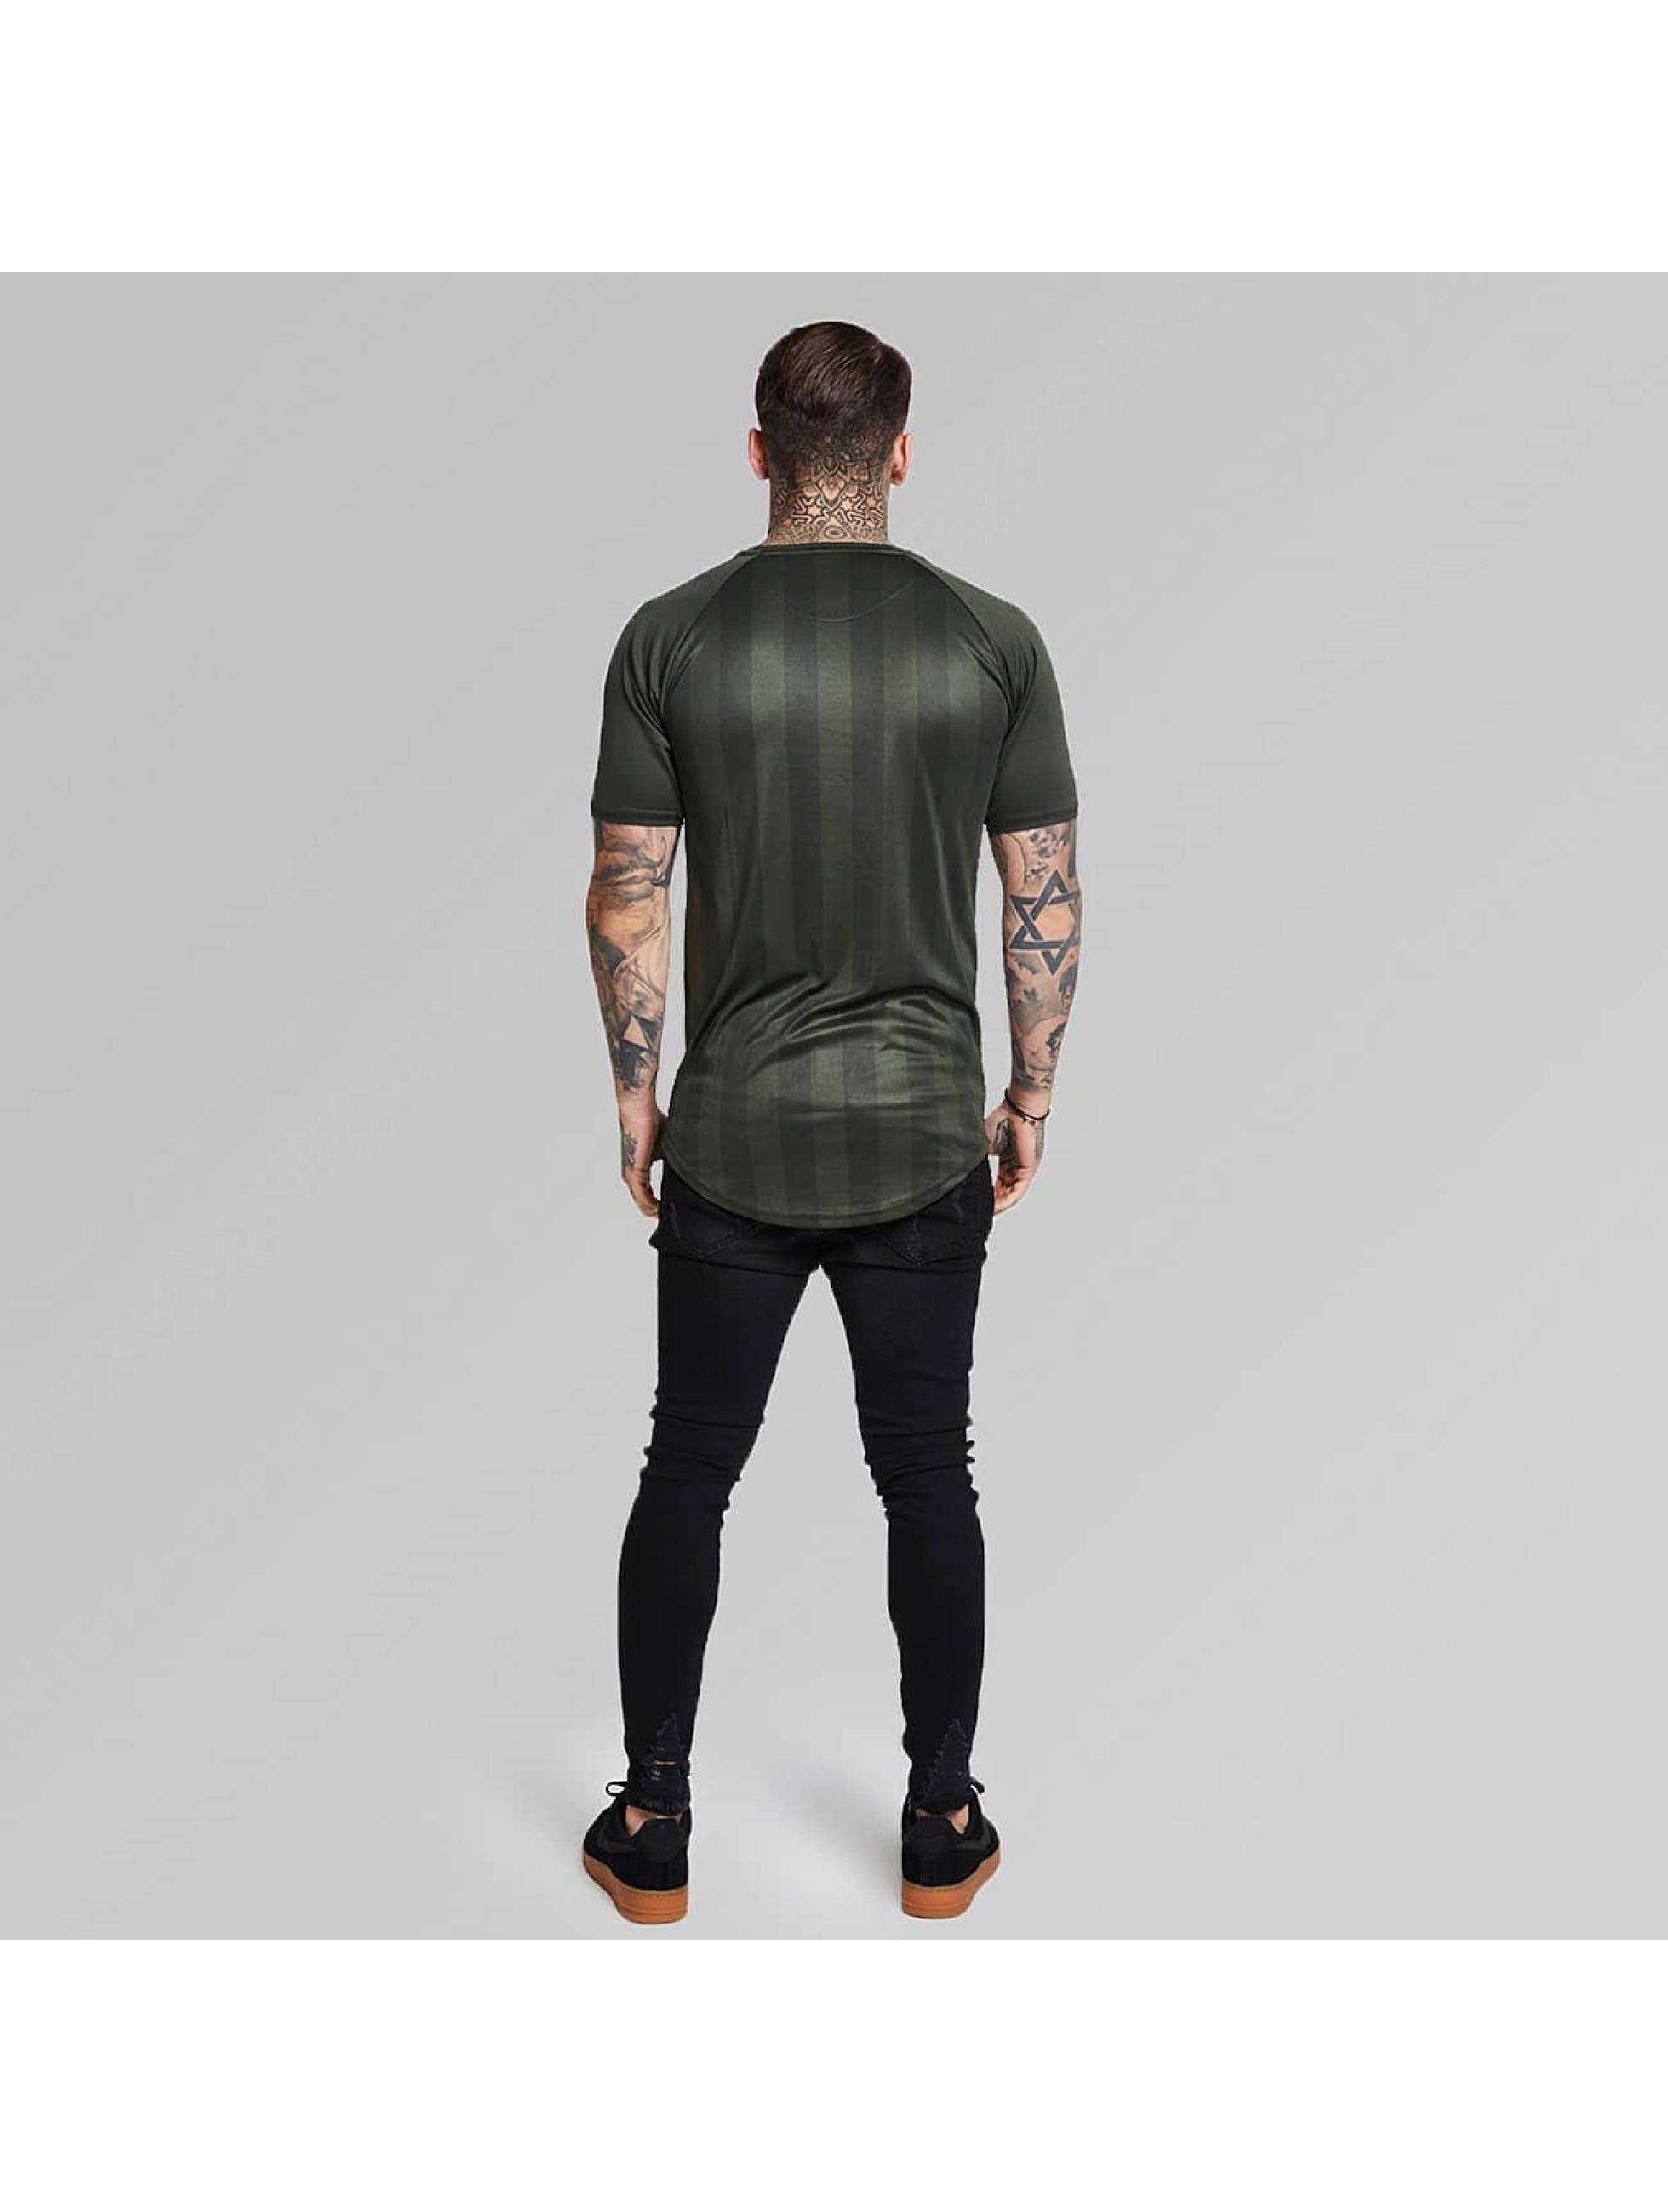 Sik Silk T-shirts Shadow Stripe khaki